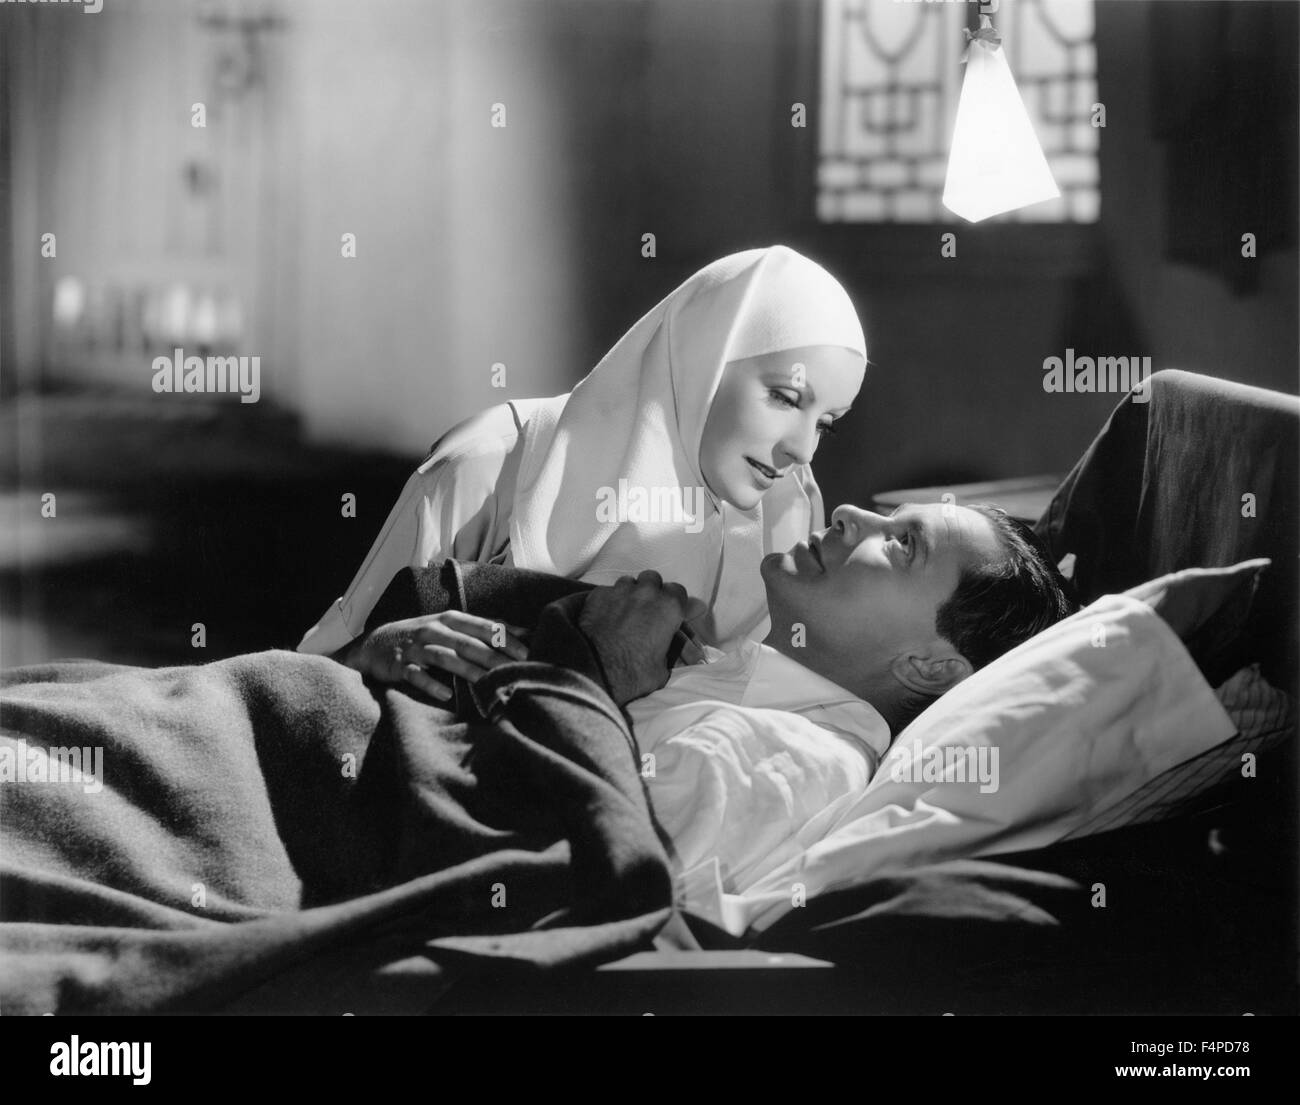 Greta Garbo, Herbert Marshall / The Painted Veil 1934 directed by Ryszard Bolesławski - Stock Image